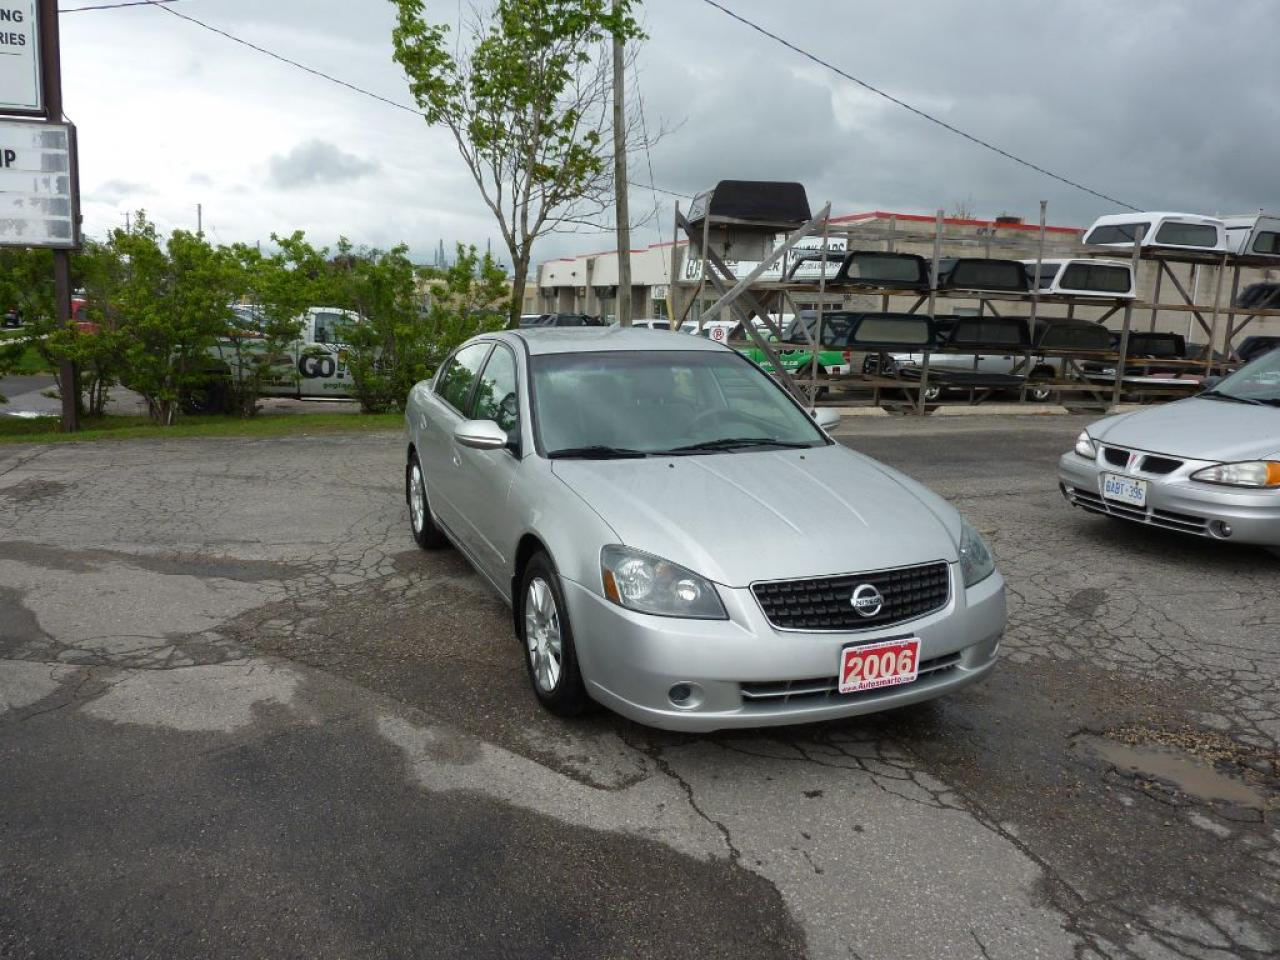 Photo of Silver 2006 Nissan Altima